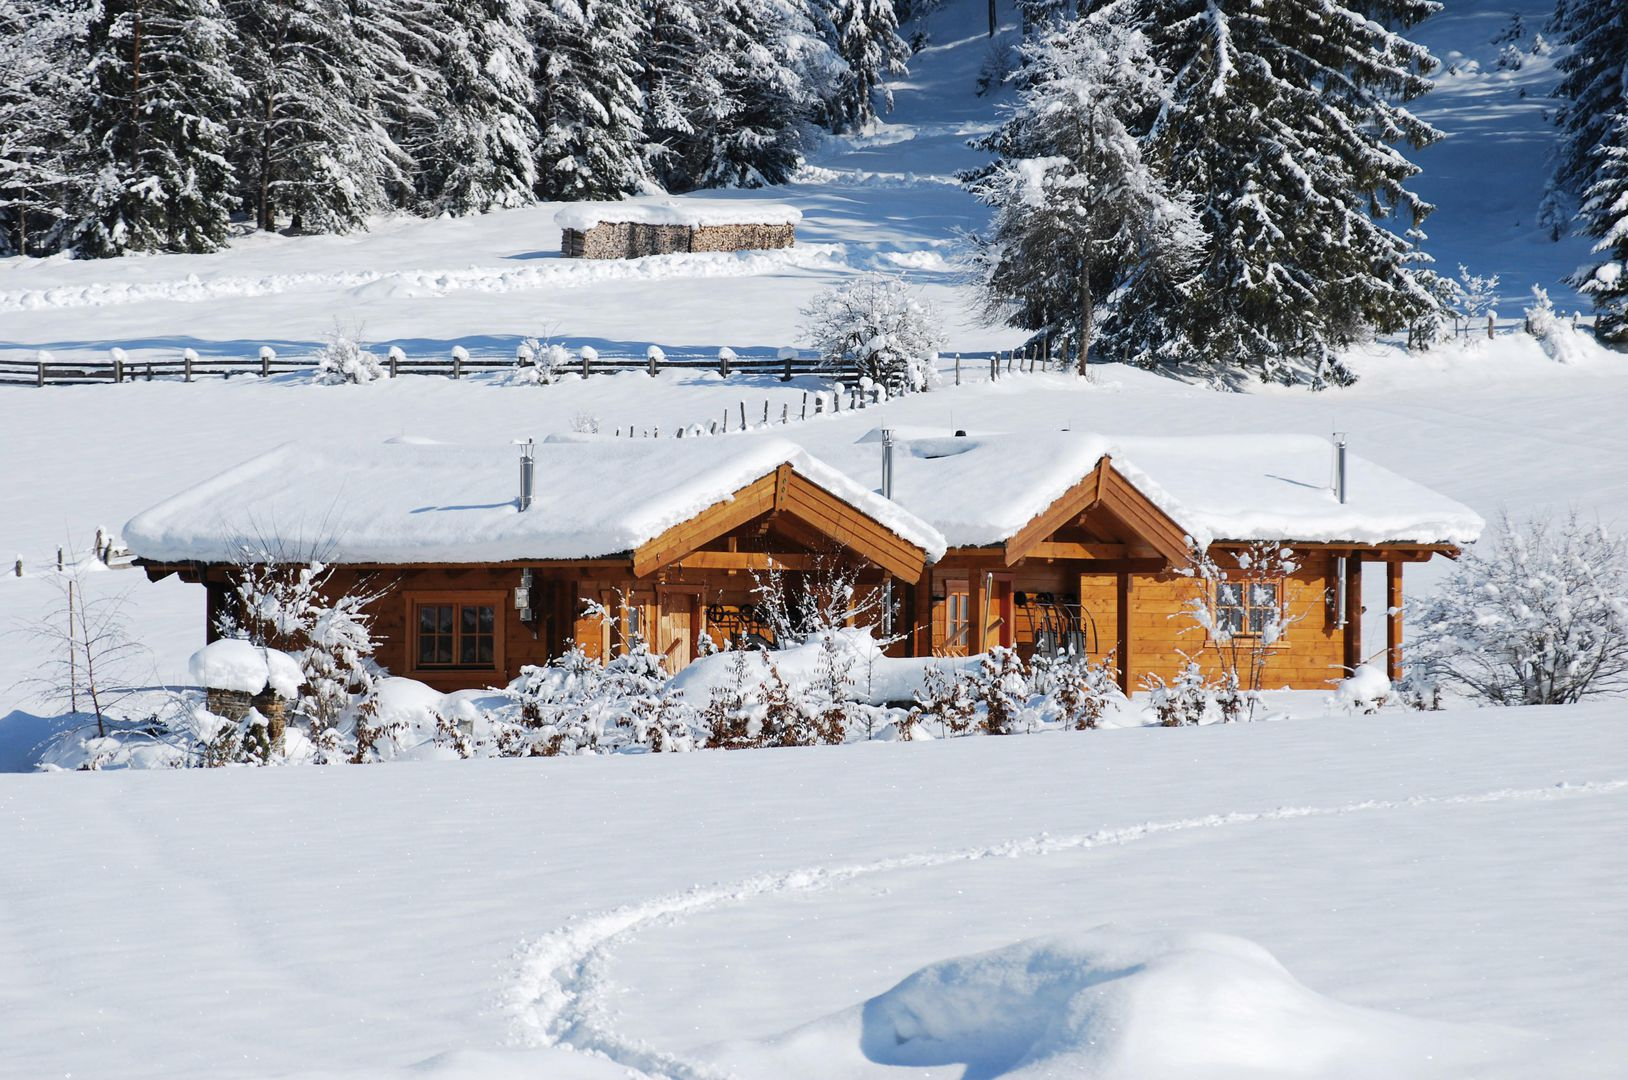 Meer info over Vitaloase Zu den drei Brüdern (Adults Only)  bij Wintertrex